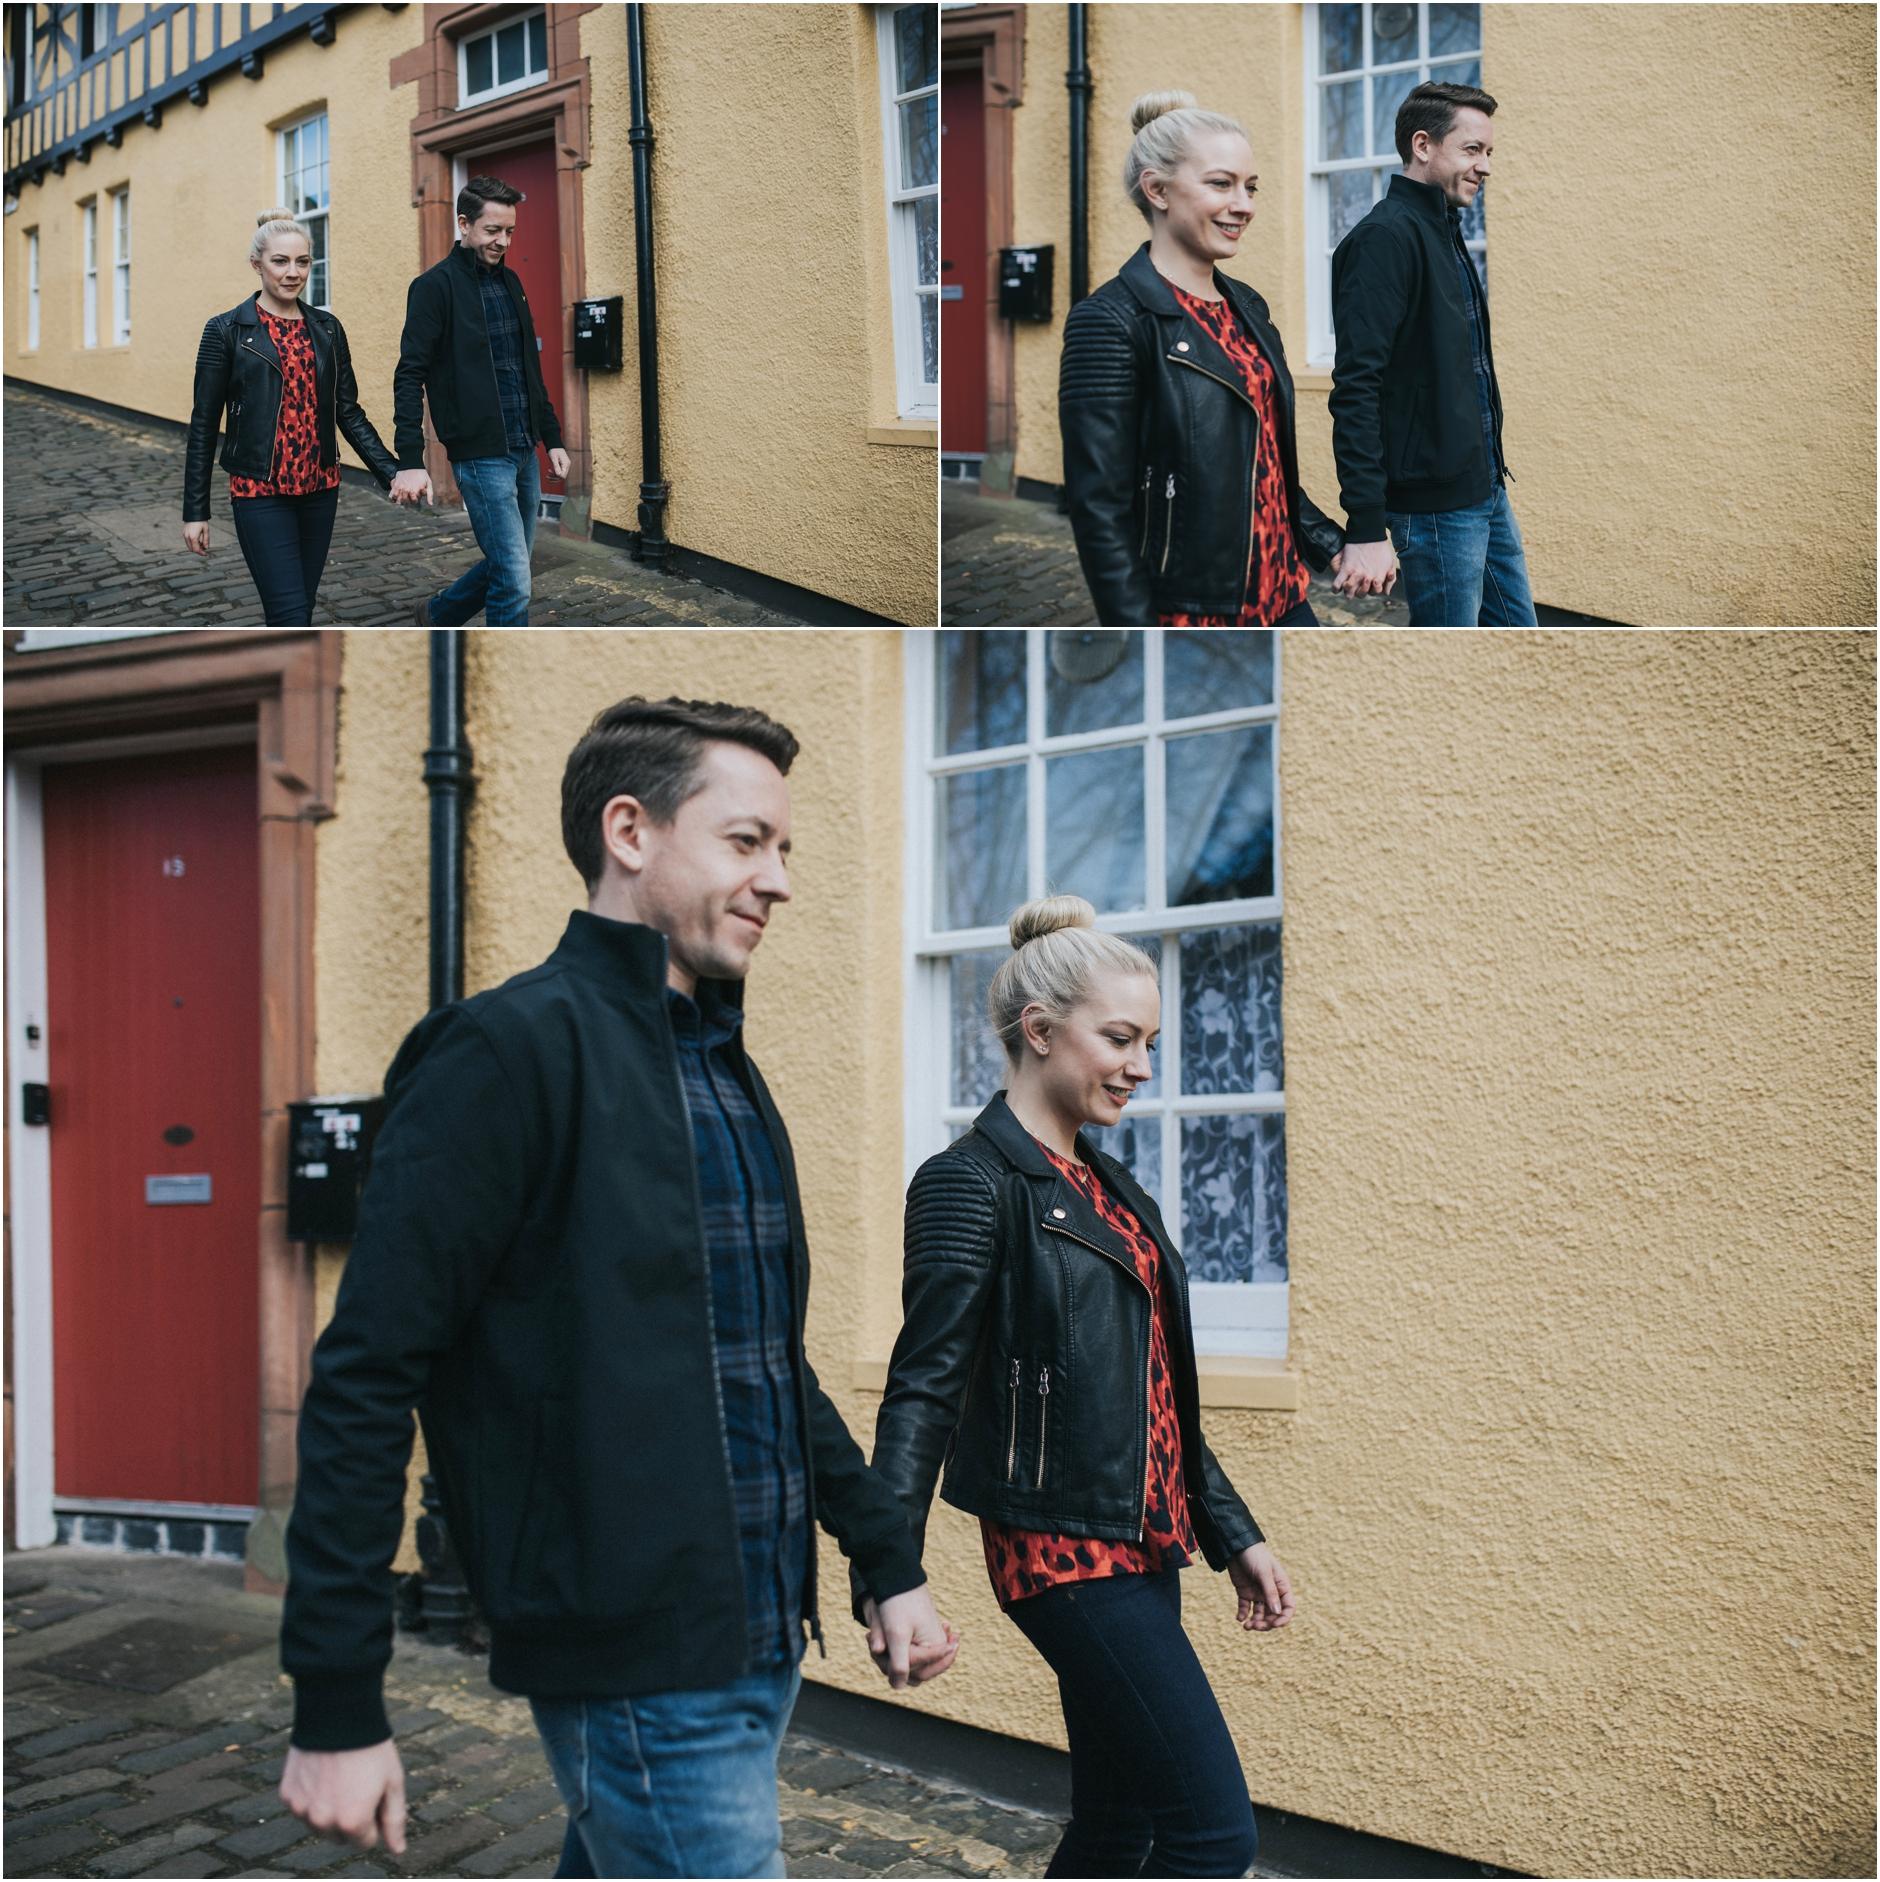 engagement photoshoot in edinburgh